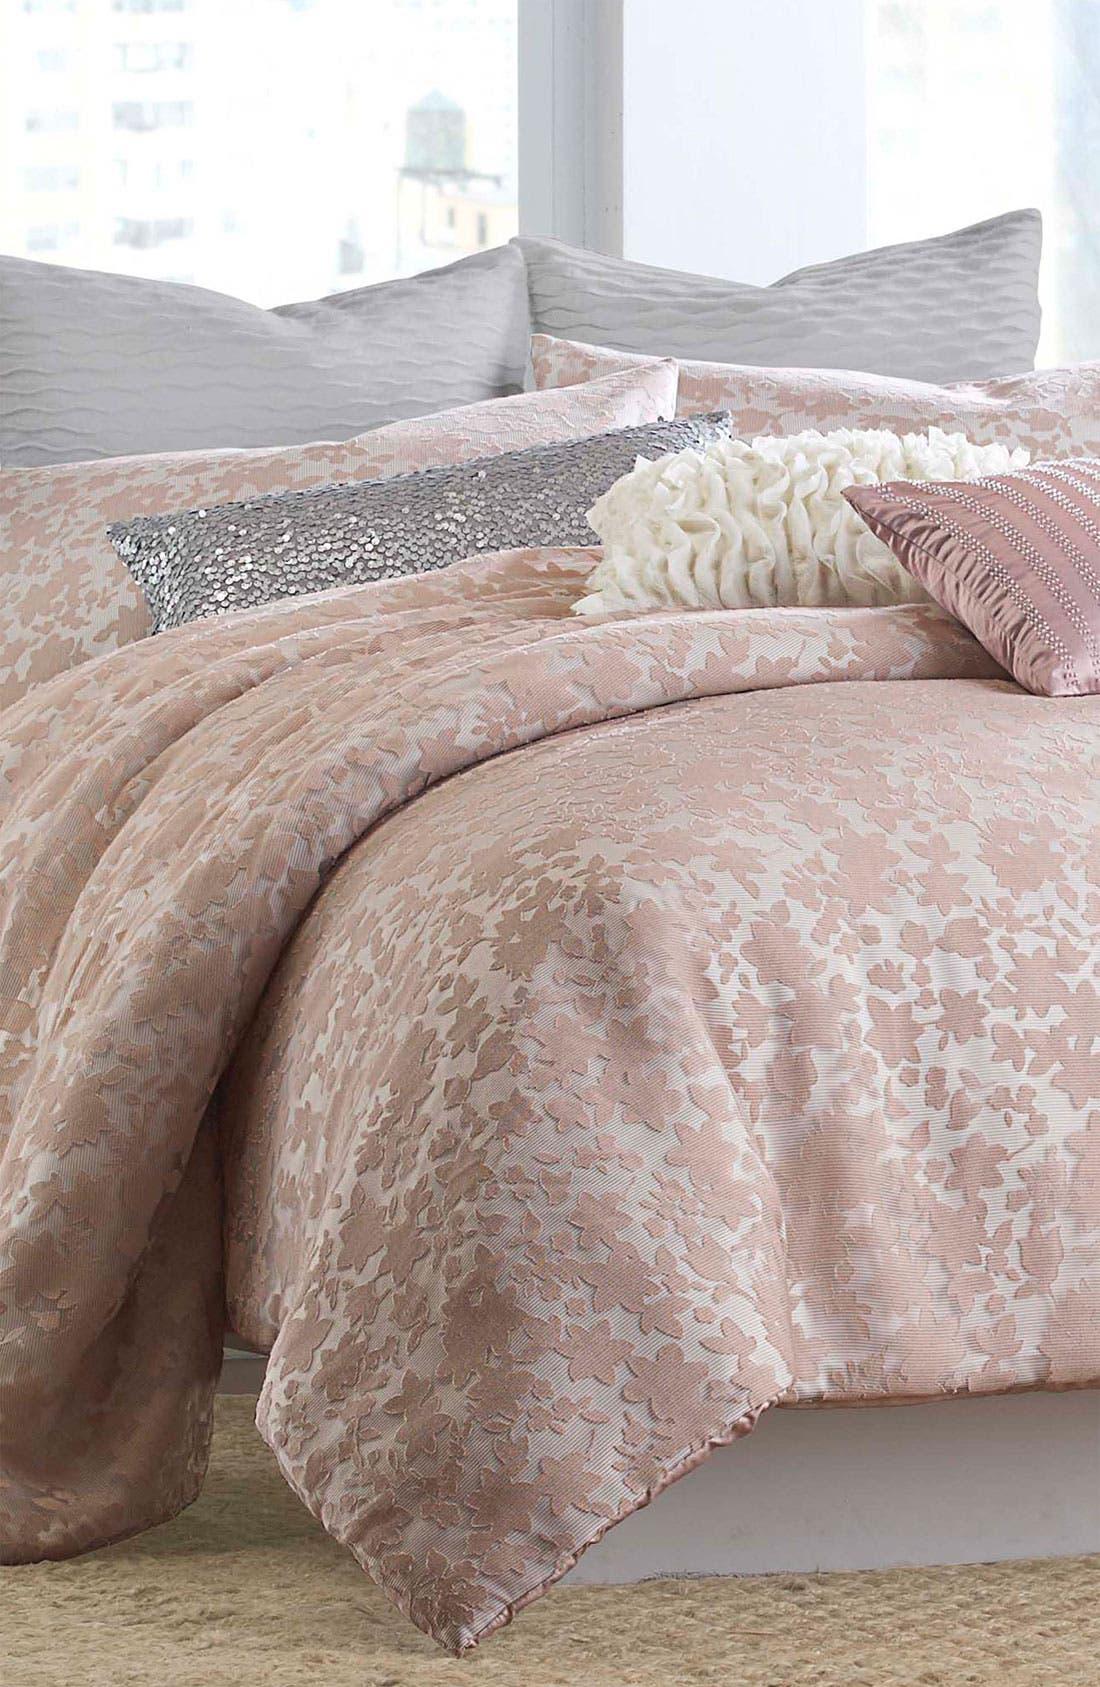 Alternate Image 1 Selected - DKNY 'Sweet Escape' Floral Comforter